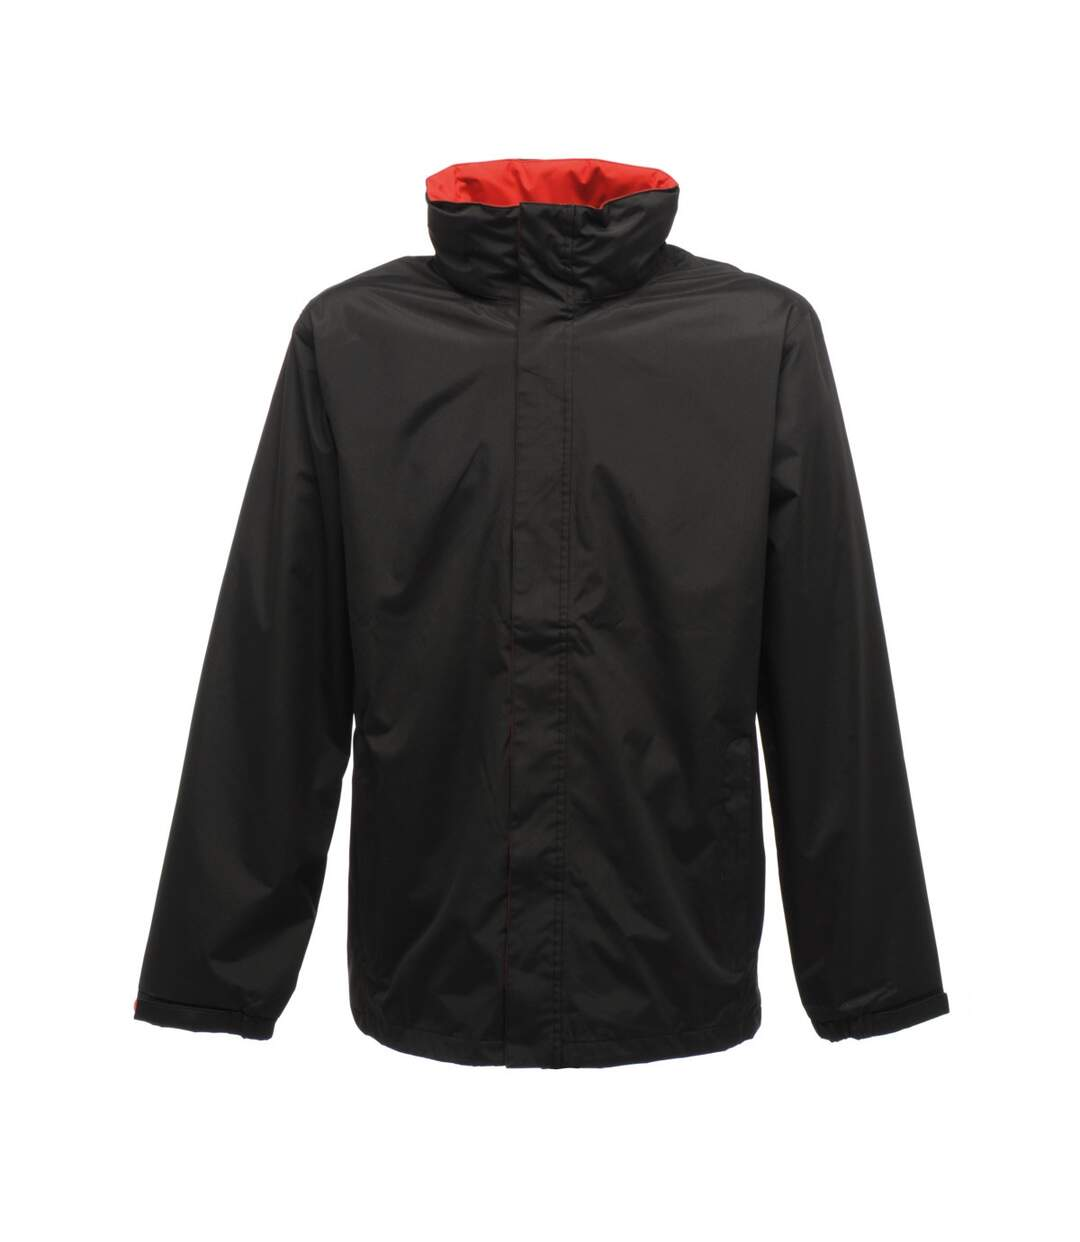 Regatta Mens Standout Ardmore Jacket (Waterproof & Windproof) (Black/Classic Red) - UTRG1603